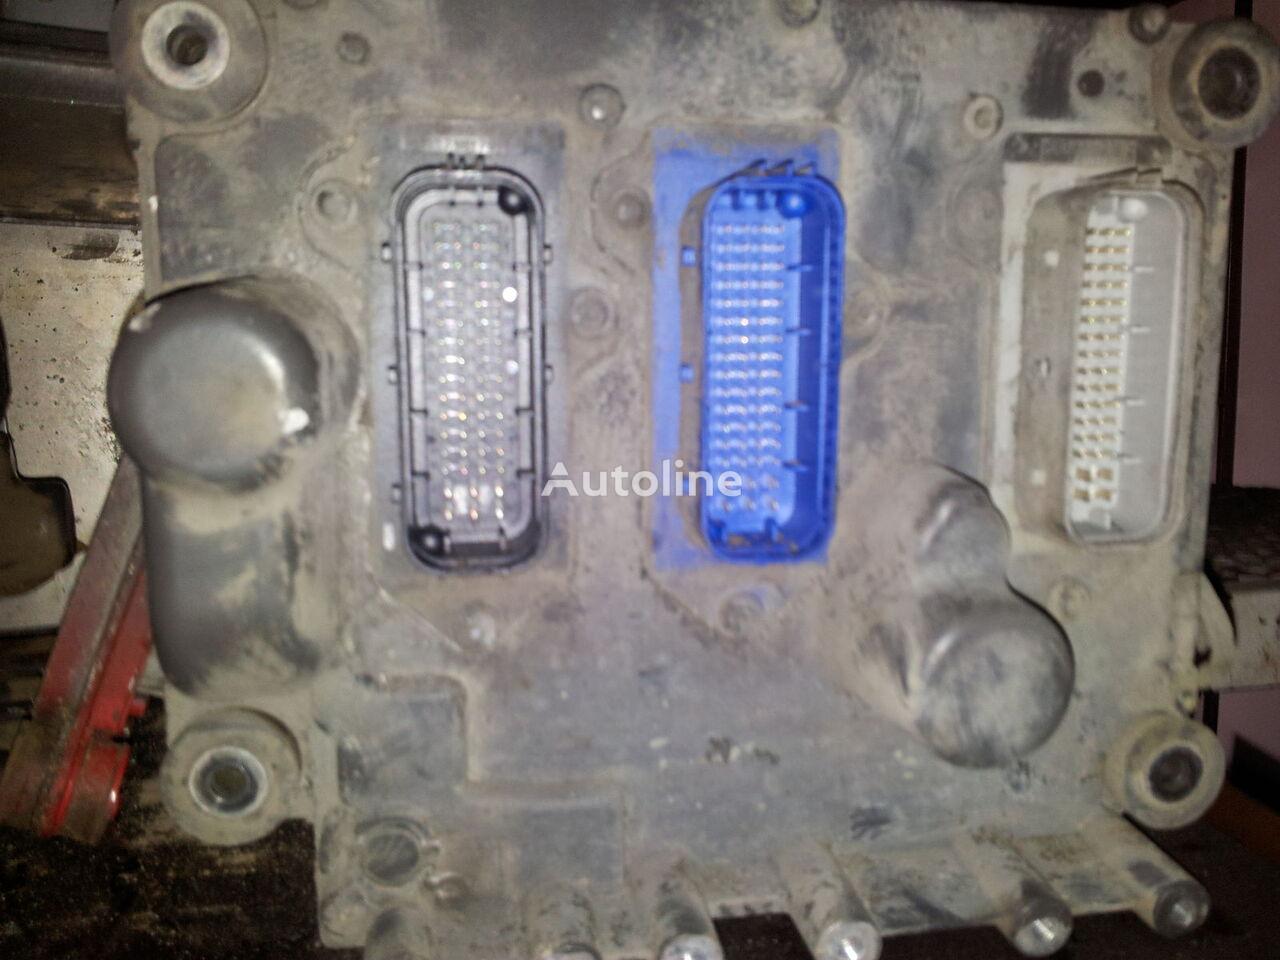 блок управления DAF EURO5 electronic control unit ECU EDC engine managment, en для тягача DAF 105XF